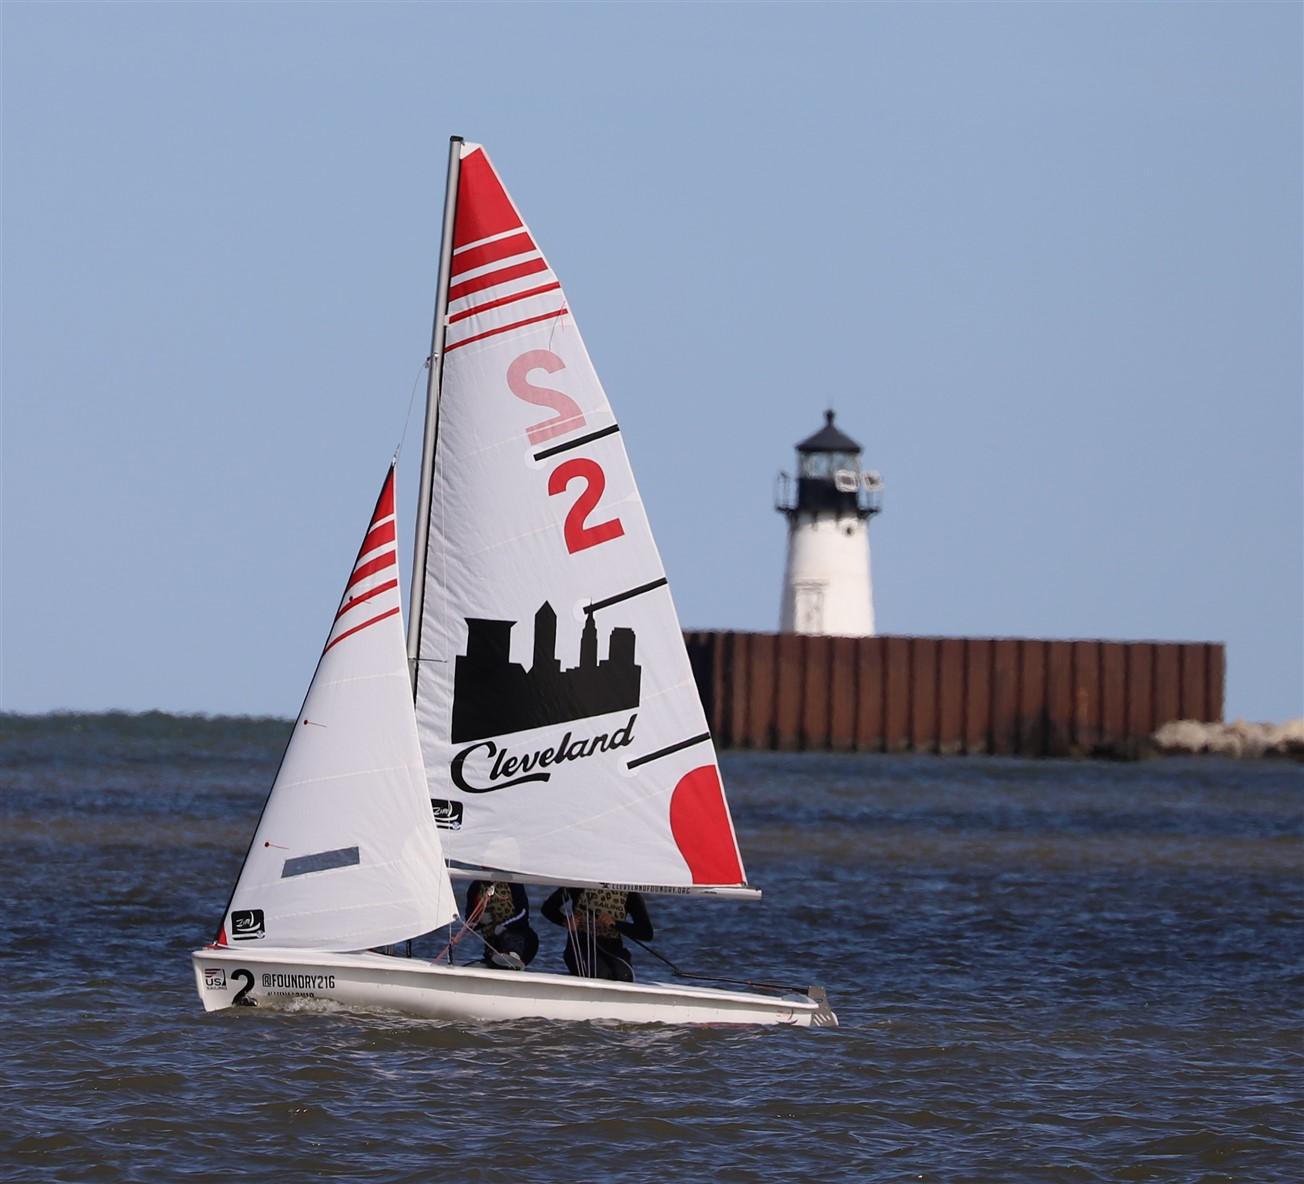 2018 09 29 89 Cleveland US Sailing Championships.jpg